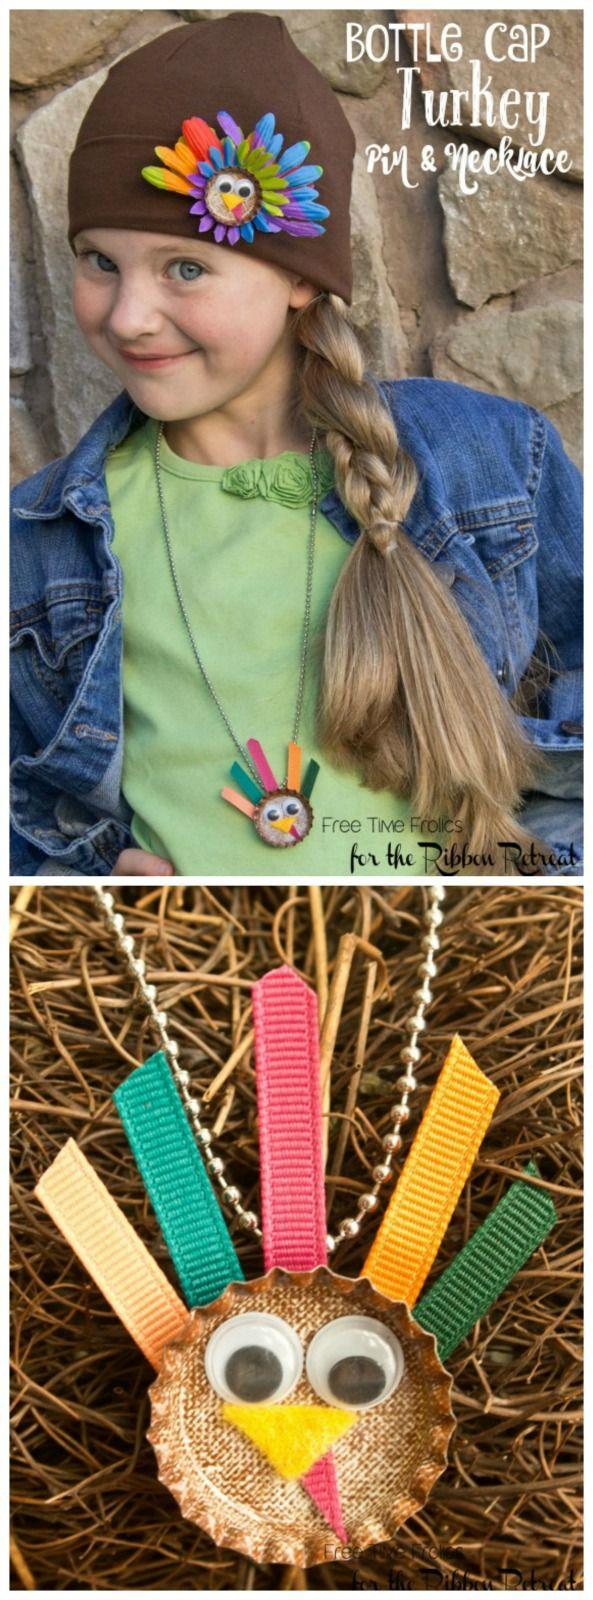 Bottle Cap Turkey Pin & Necklace - The Ribbon Retreat Blog